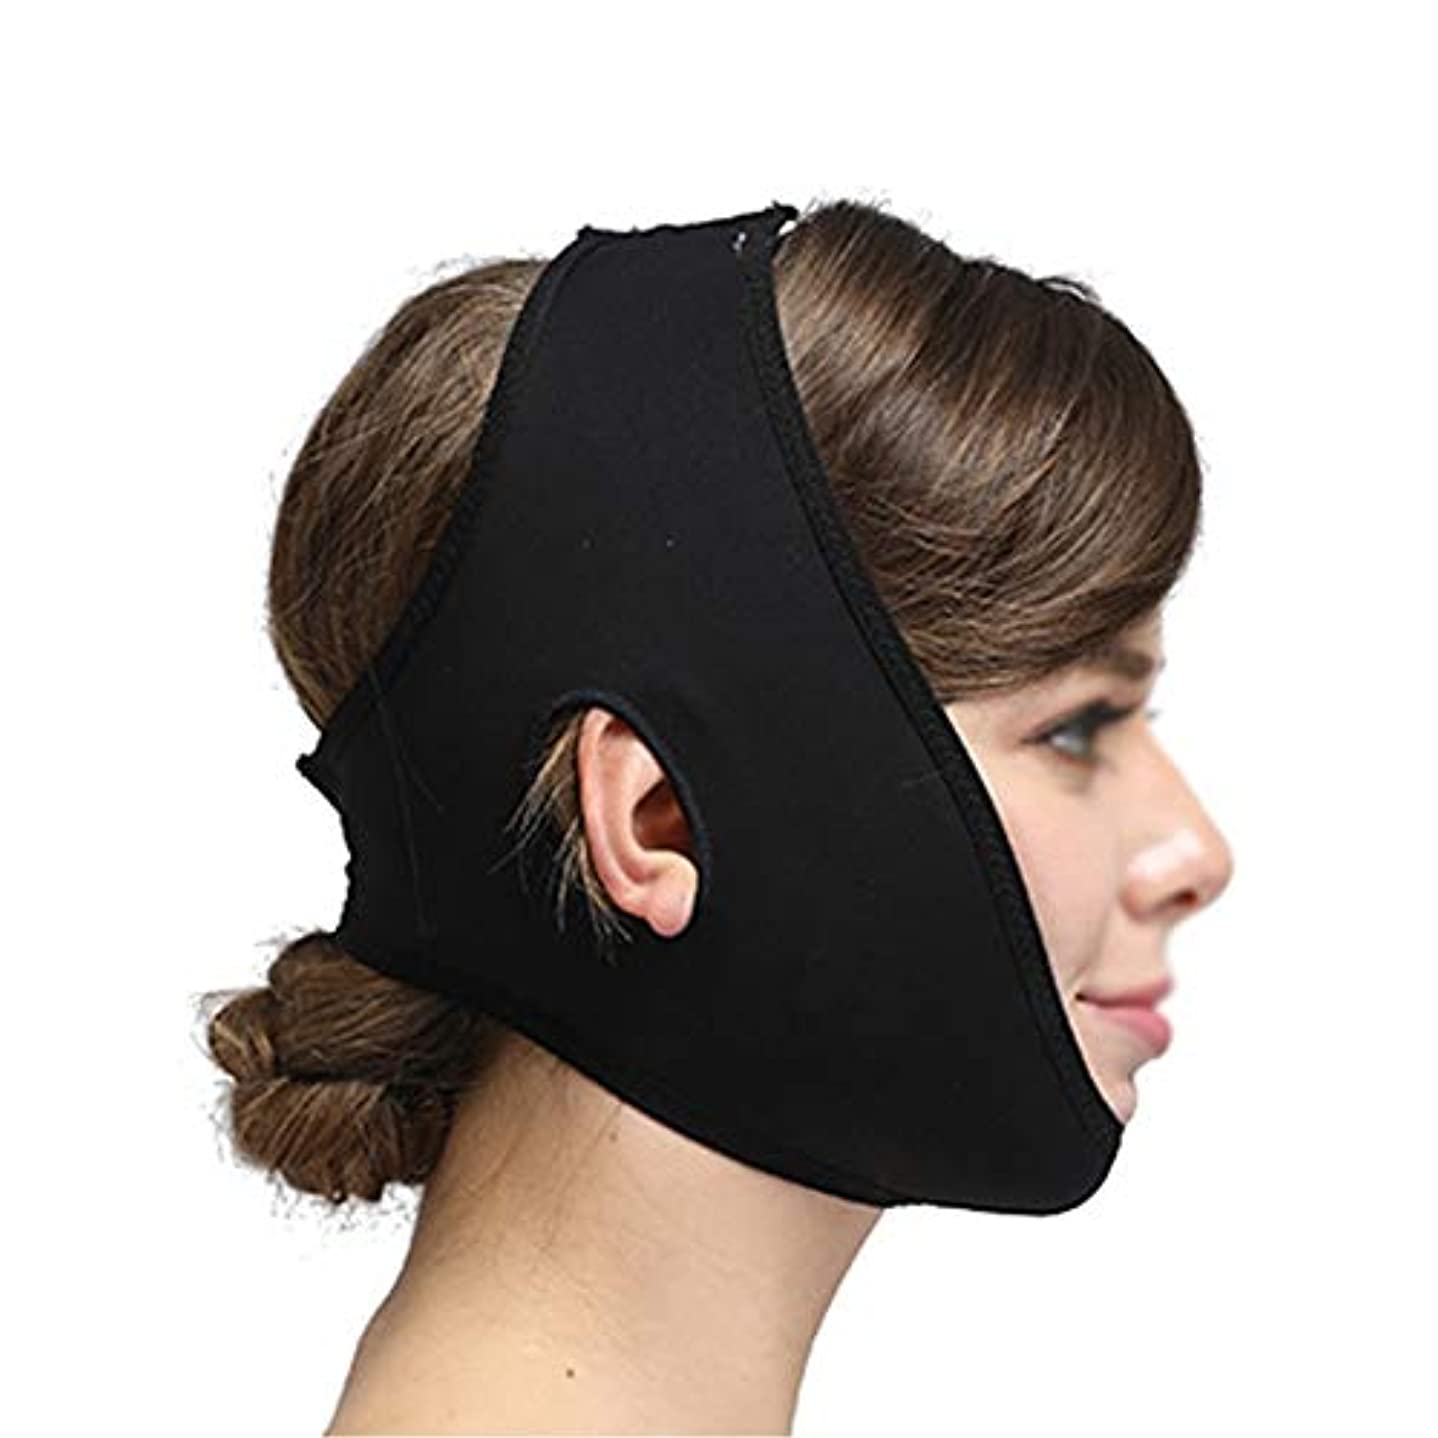 XHLMRMJ フェイシャル彫刻道具、弾力性のあるヘッドギア、脂肪吸引術、薄い顔、二重あご (Color : Black, Size : S)